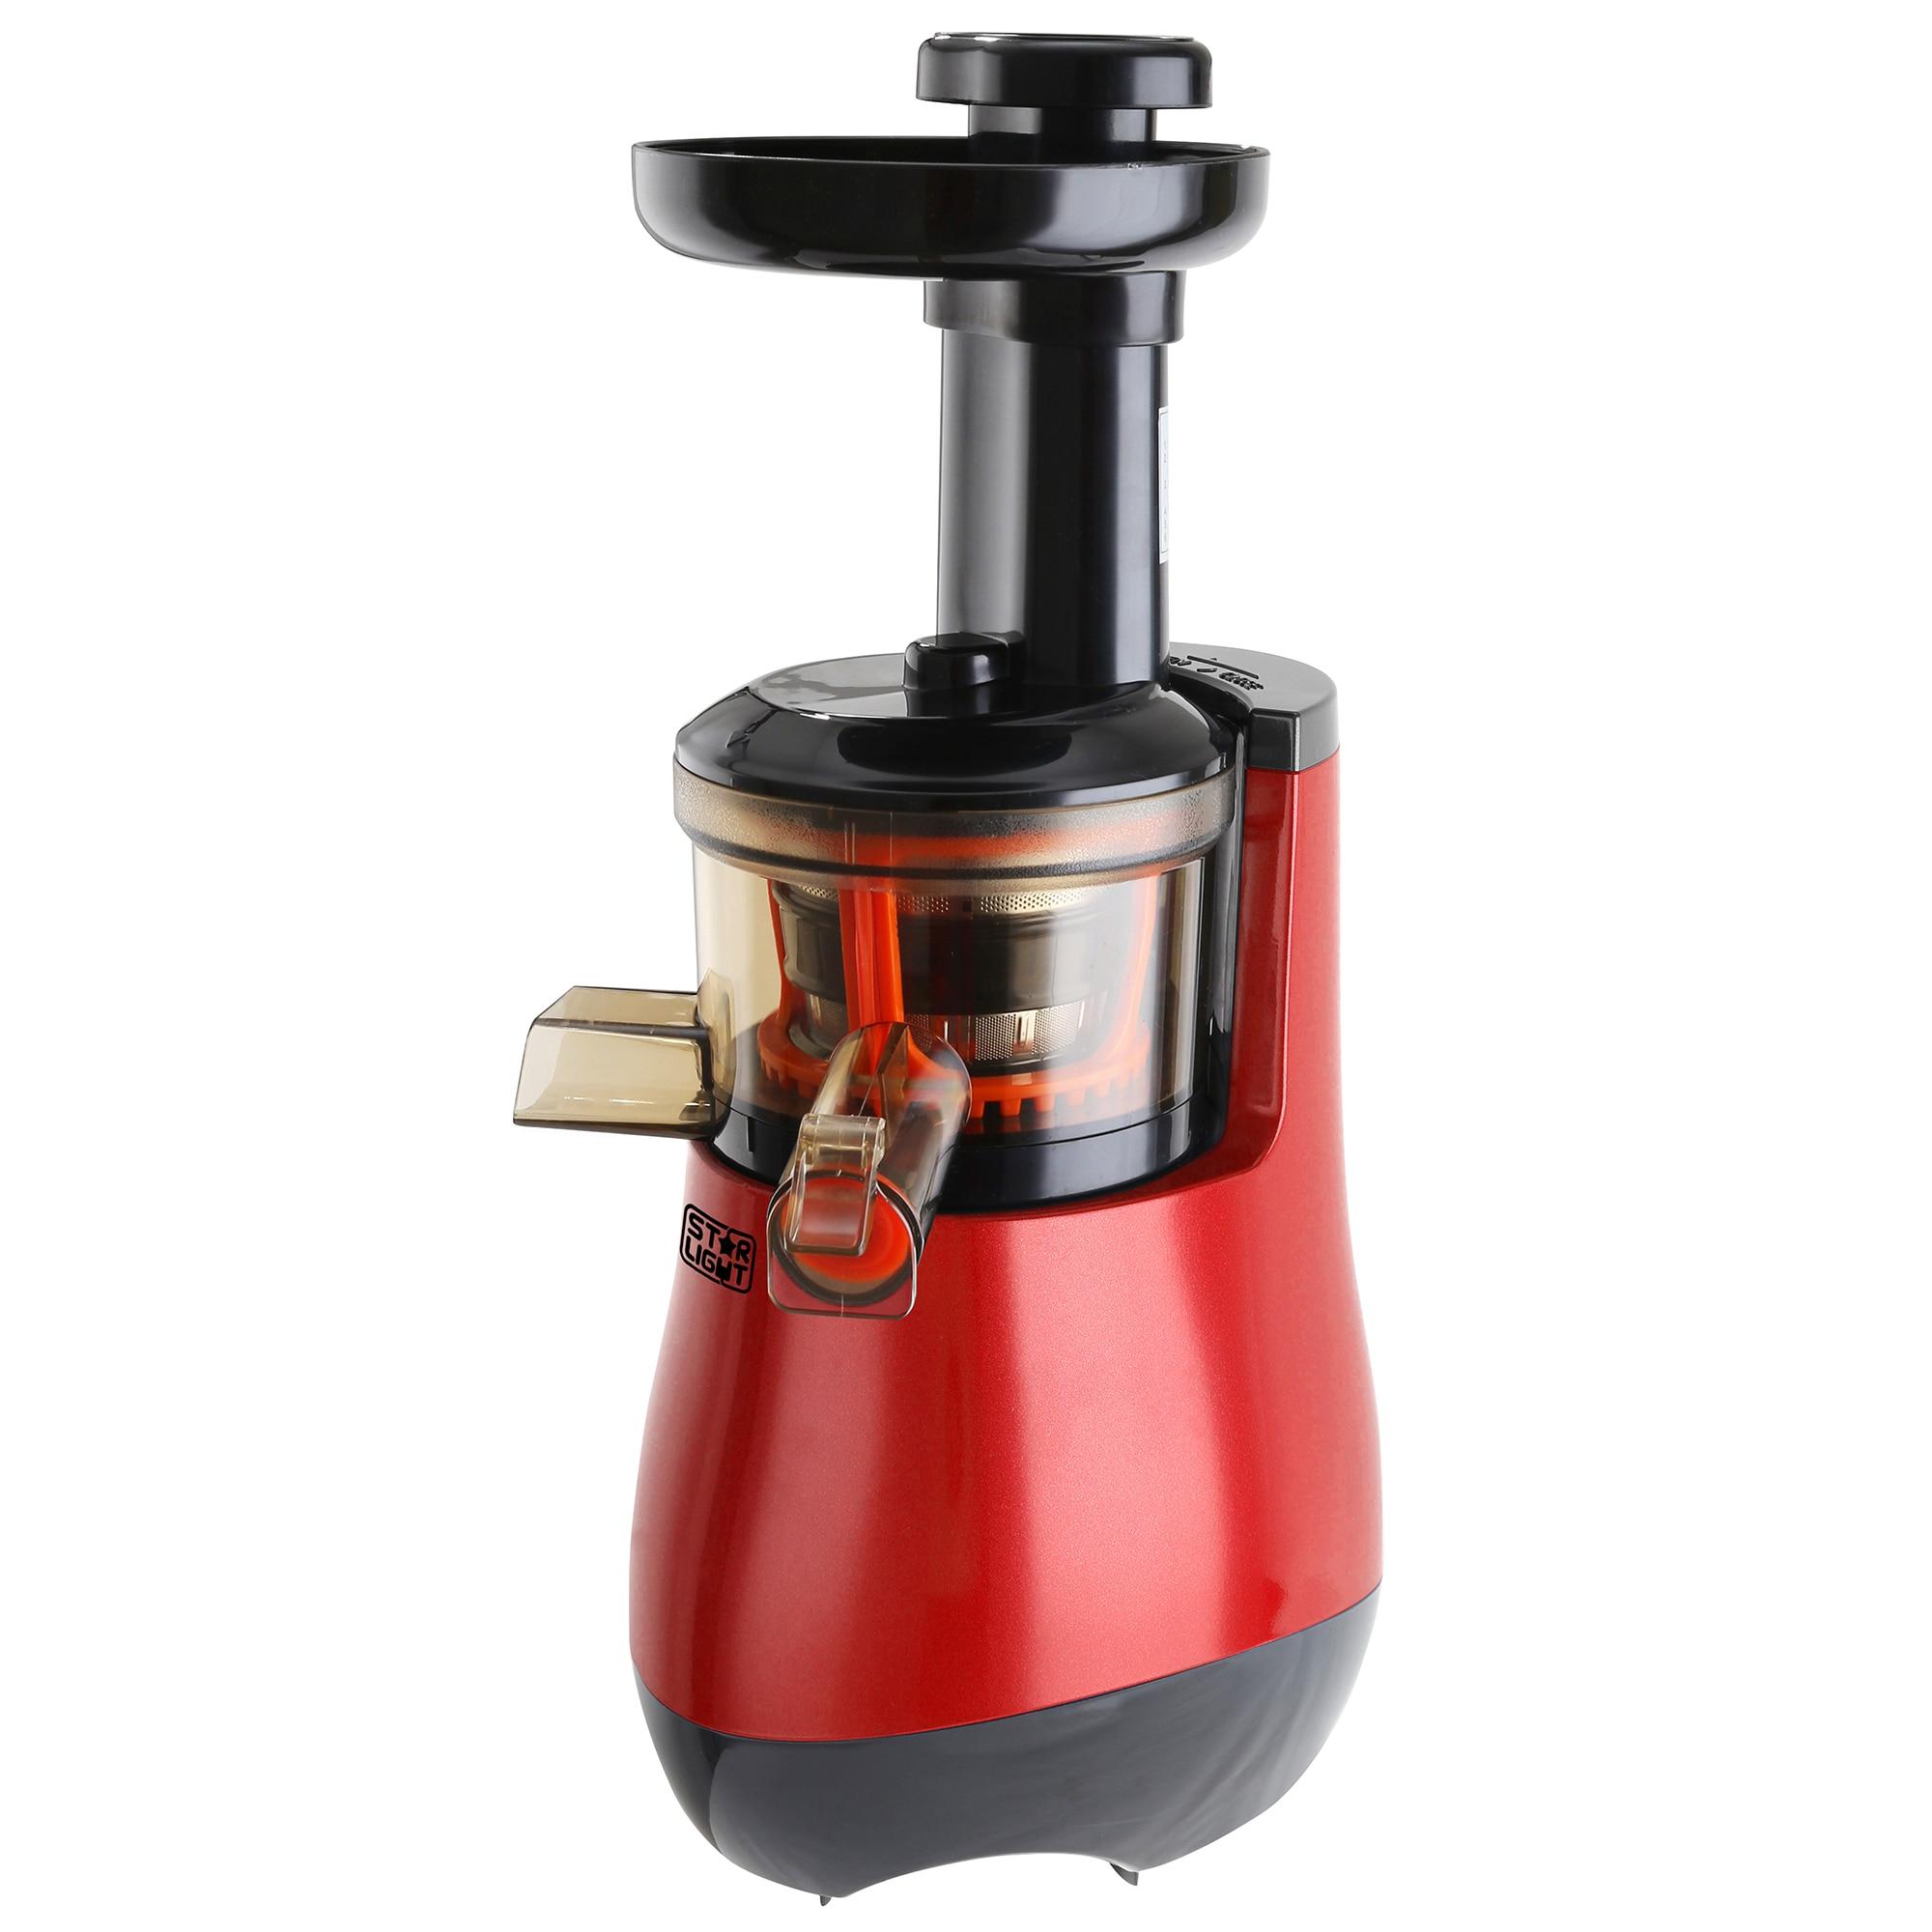 Fotografie Storcator de fructe si legume cu melc Star-Light SJB-150R, 150 W, 55 RPM, Recipient suc 1.0 l, Recipient pulpa 0.8 l, Functie Reverse, Rosu